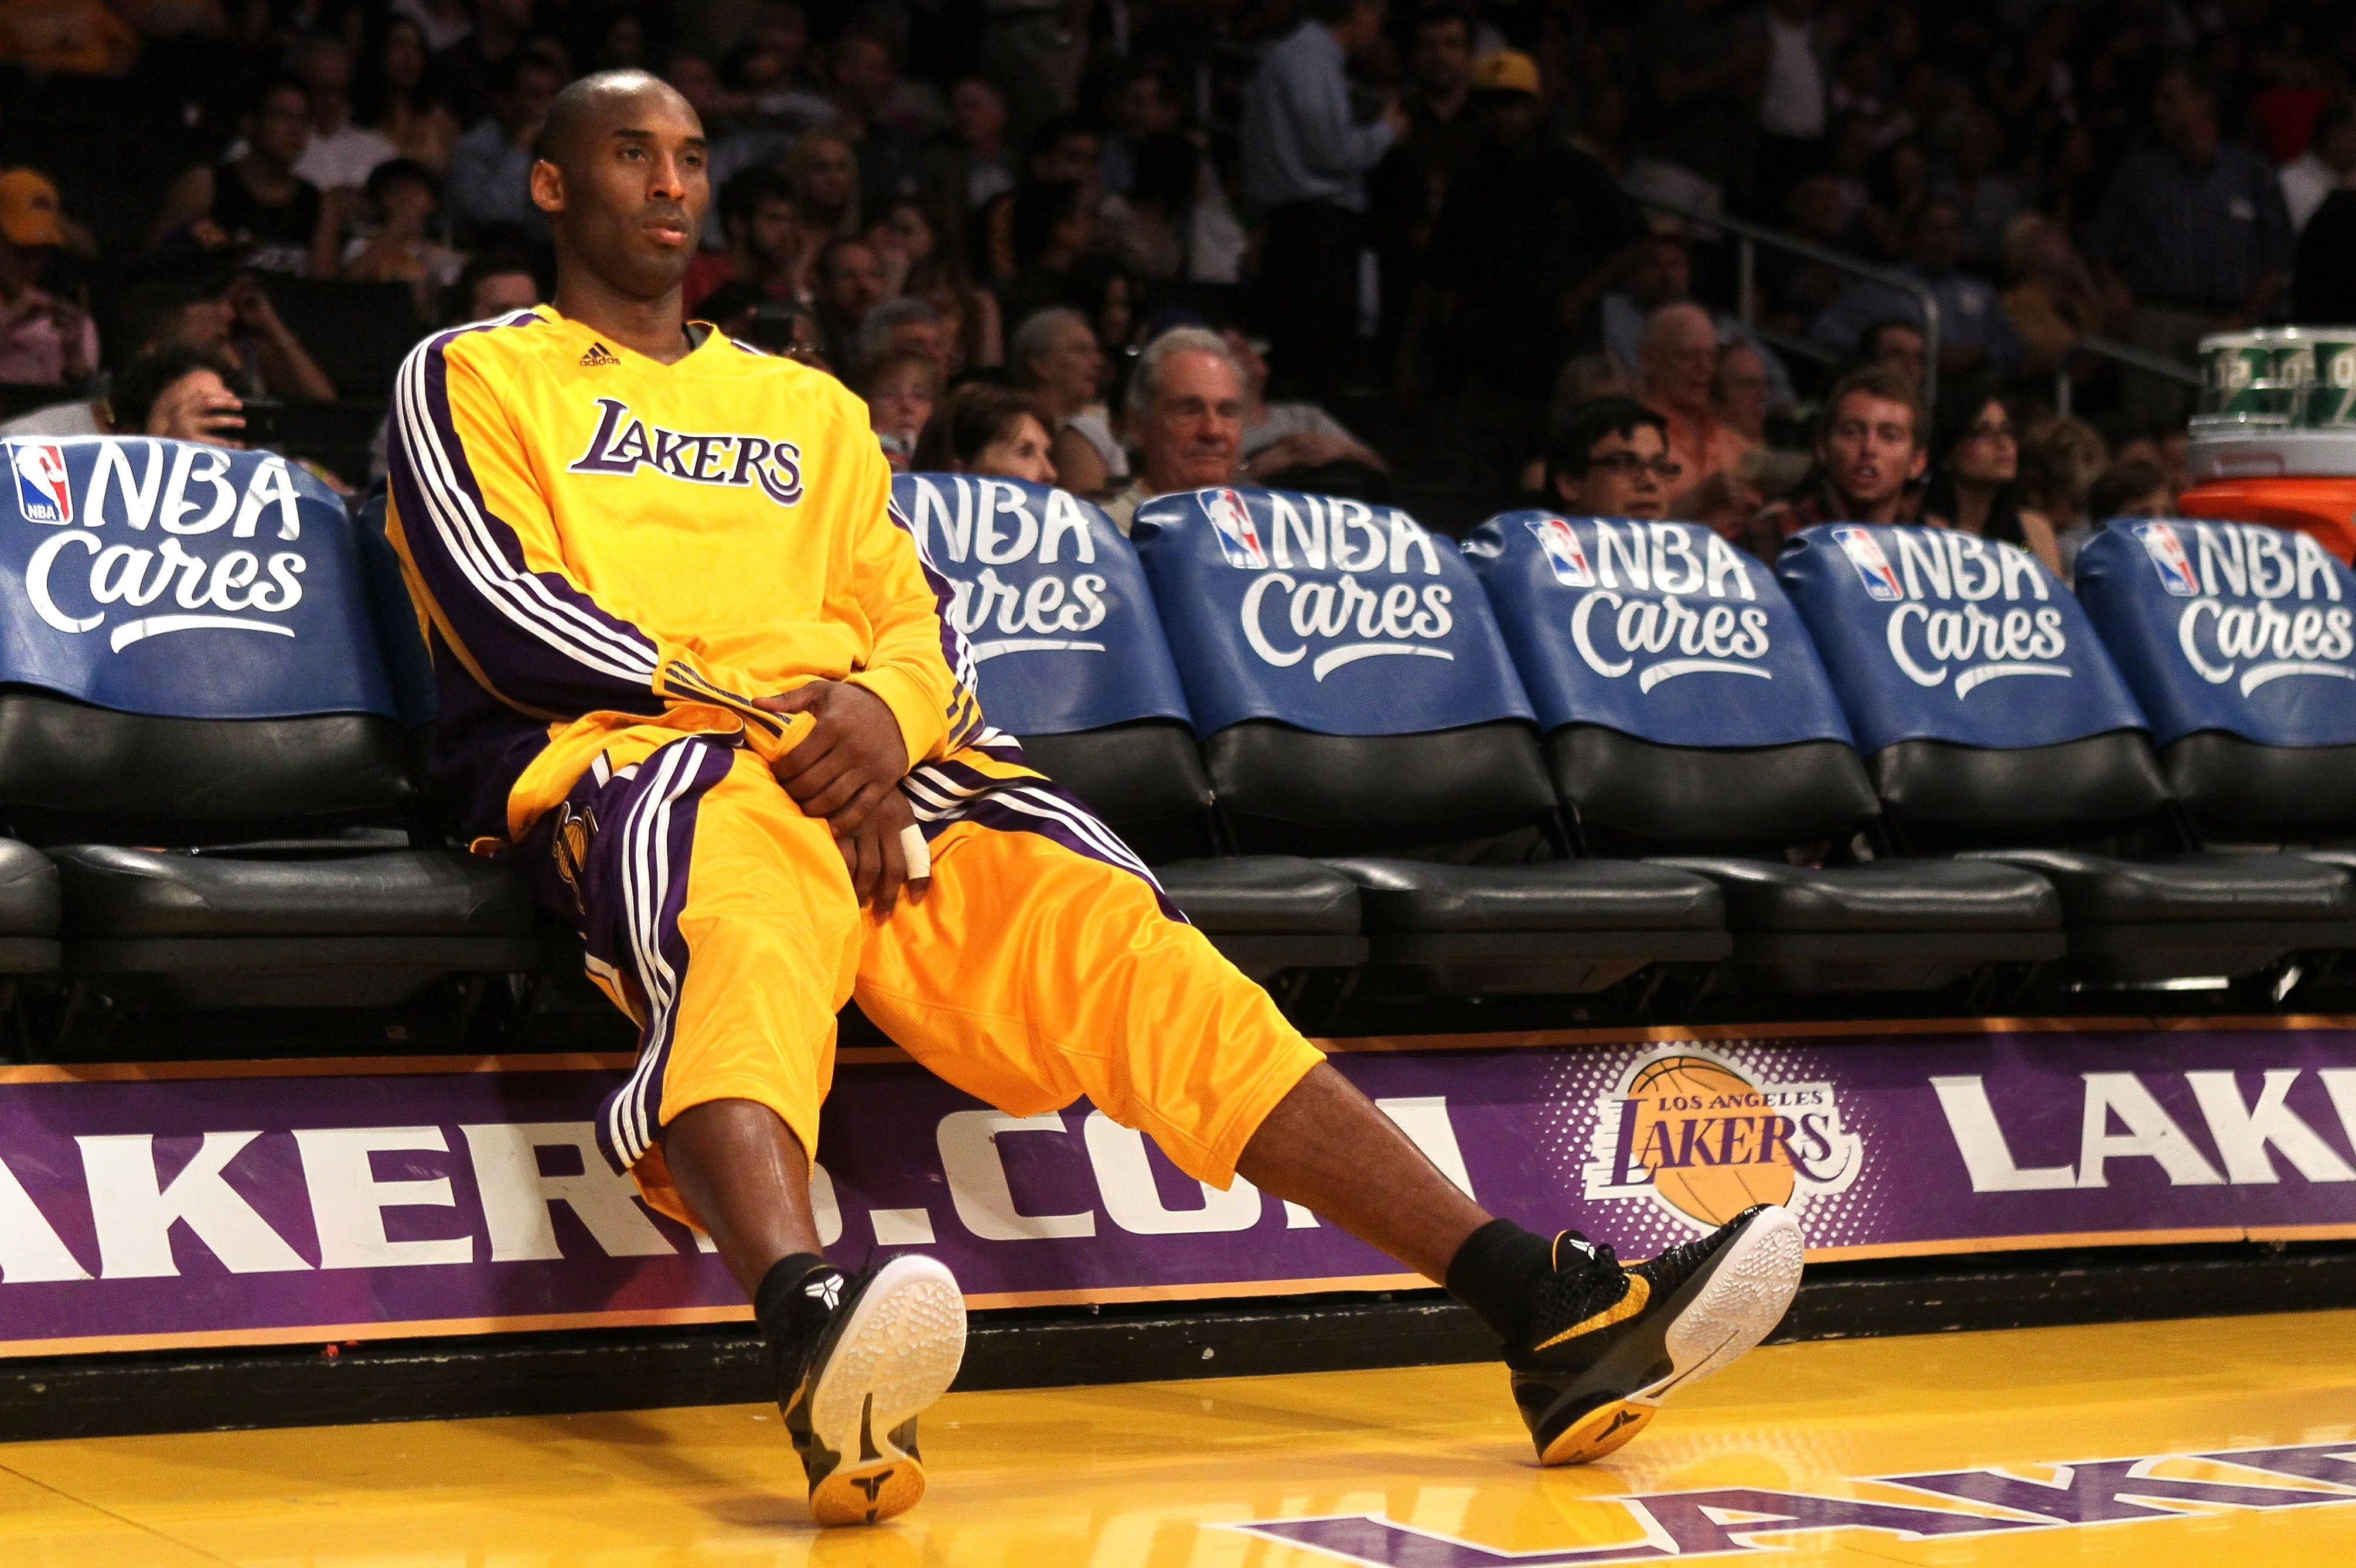 Kobe Bryant Nba Basketball Kobe Bryant Los Angeles Lakers 4k Wallpaper Hdwallpaper Desktop Kobe Bryant Wallpaper Kobe Bryant Kobe Bryant Poster